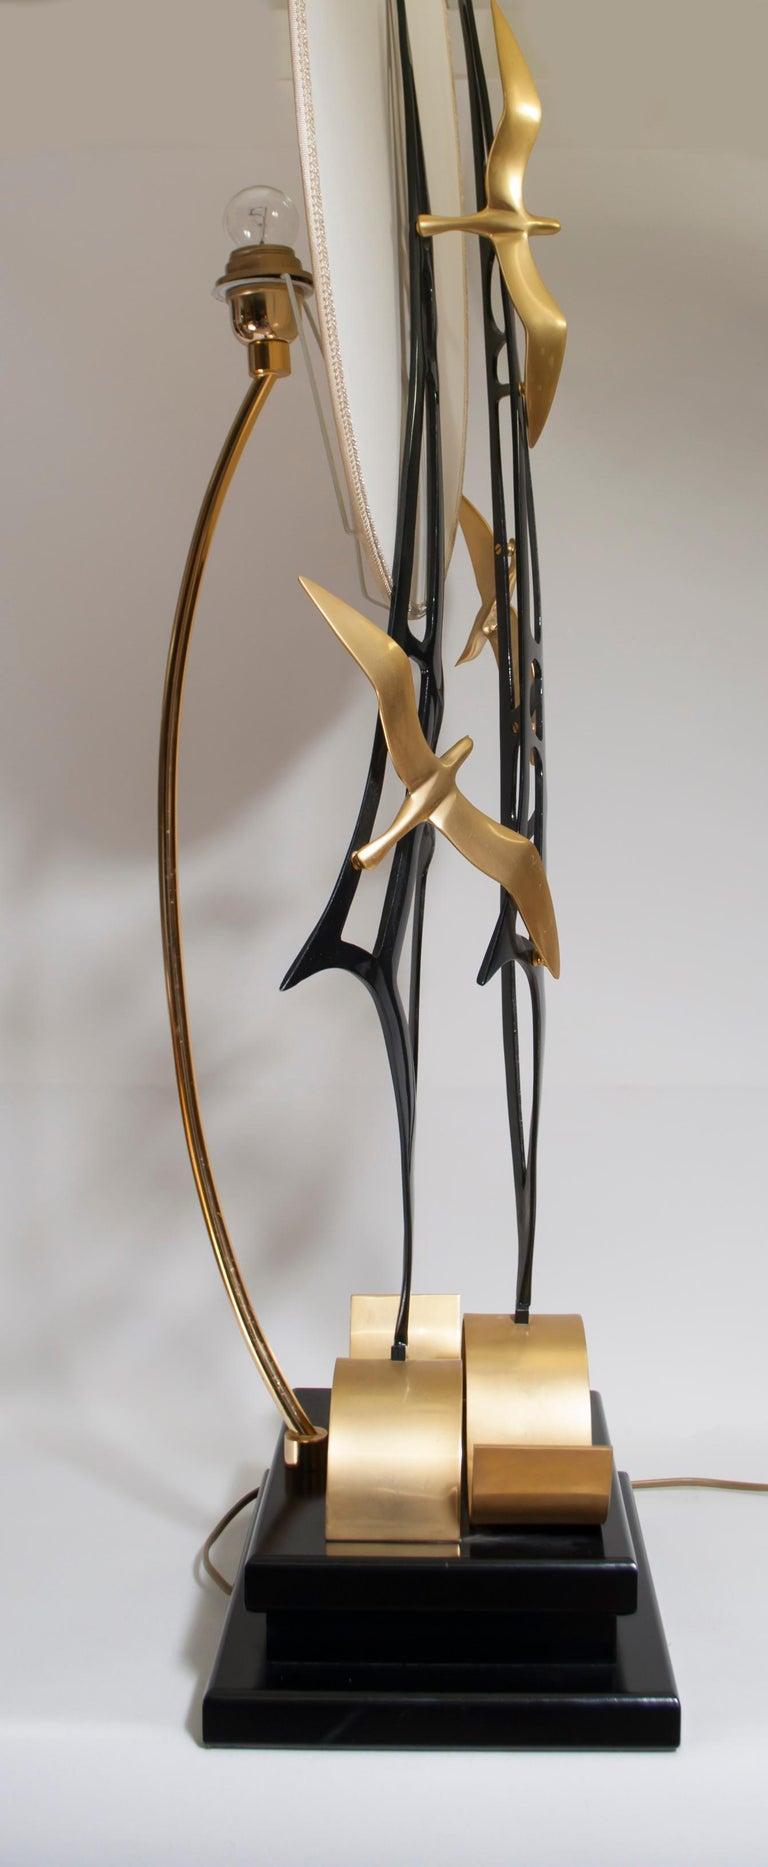 Lanciotto Galeotti Midcentury Gold-Plated Lamp Italian by L'Originale, 1970s 4